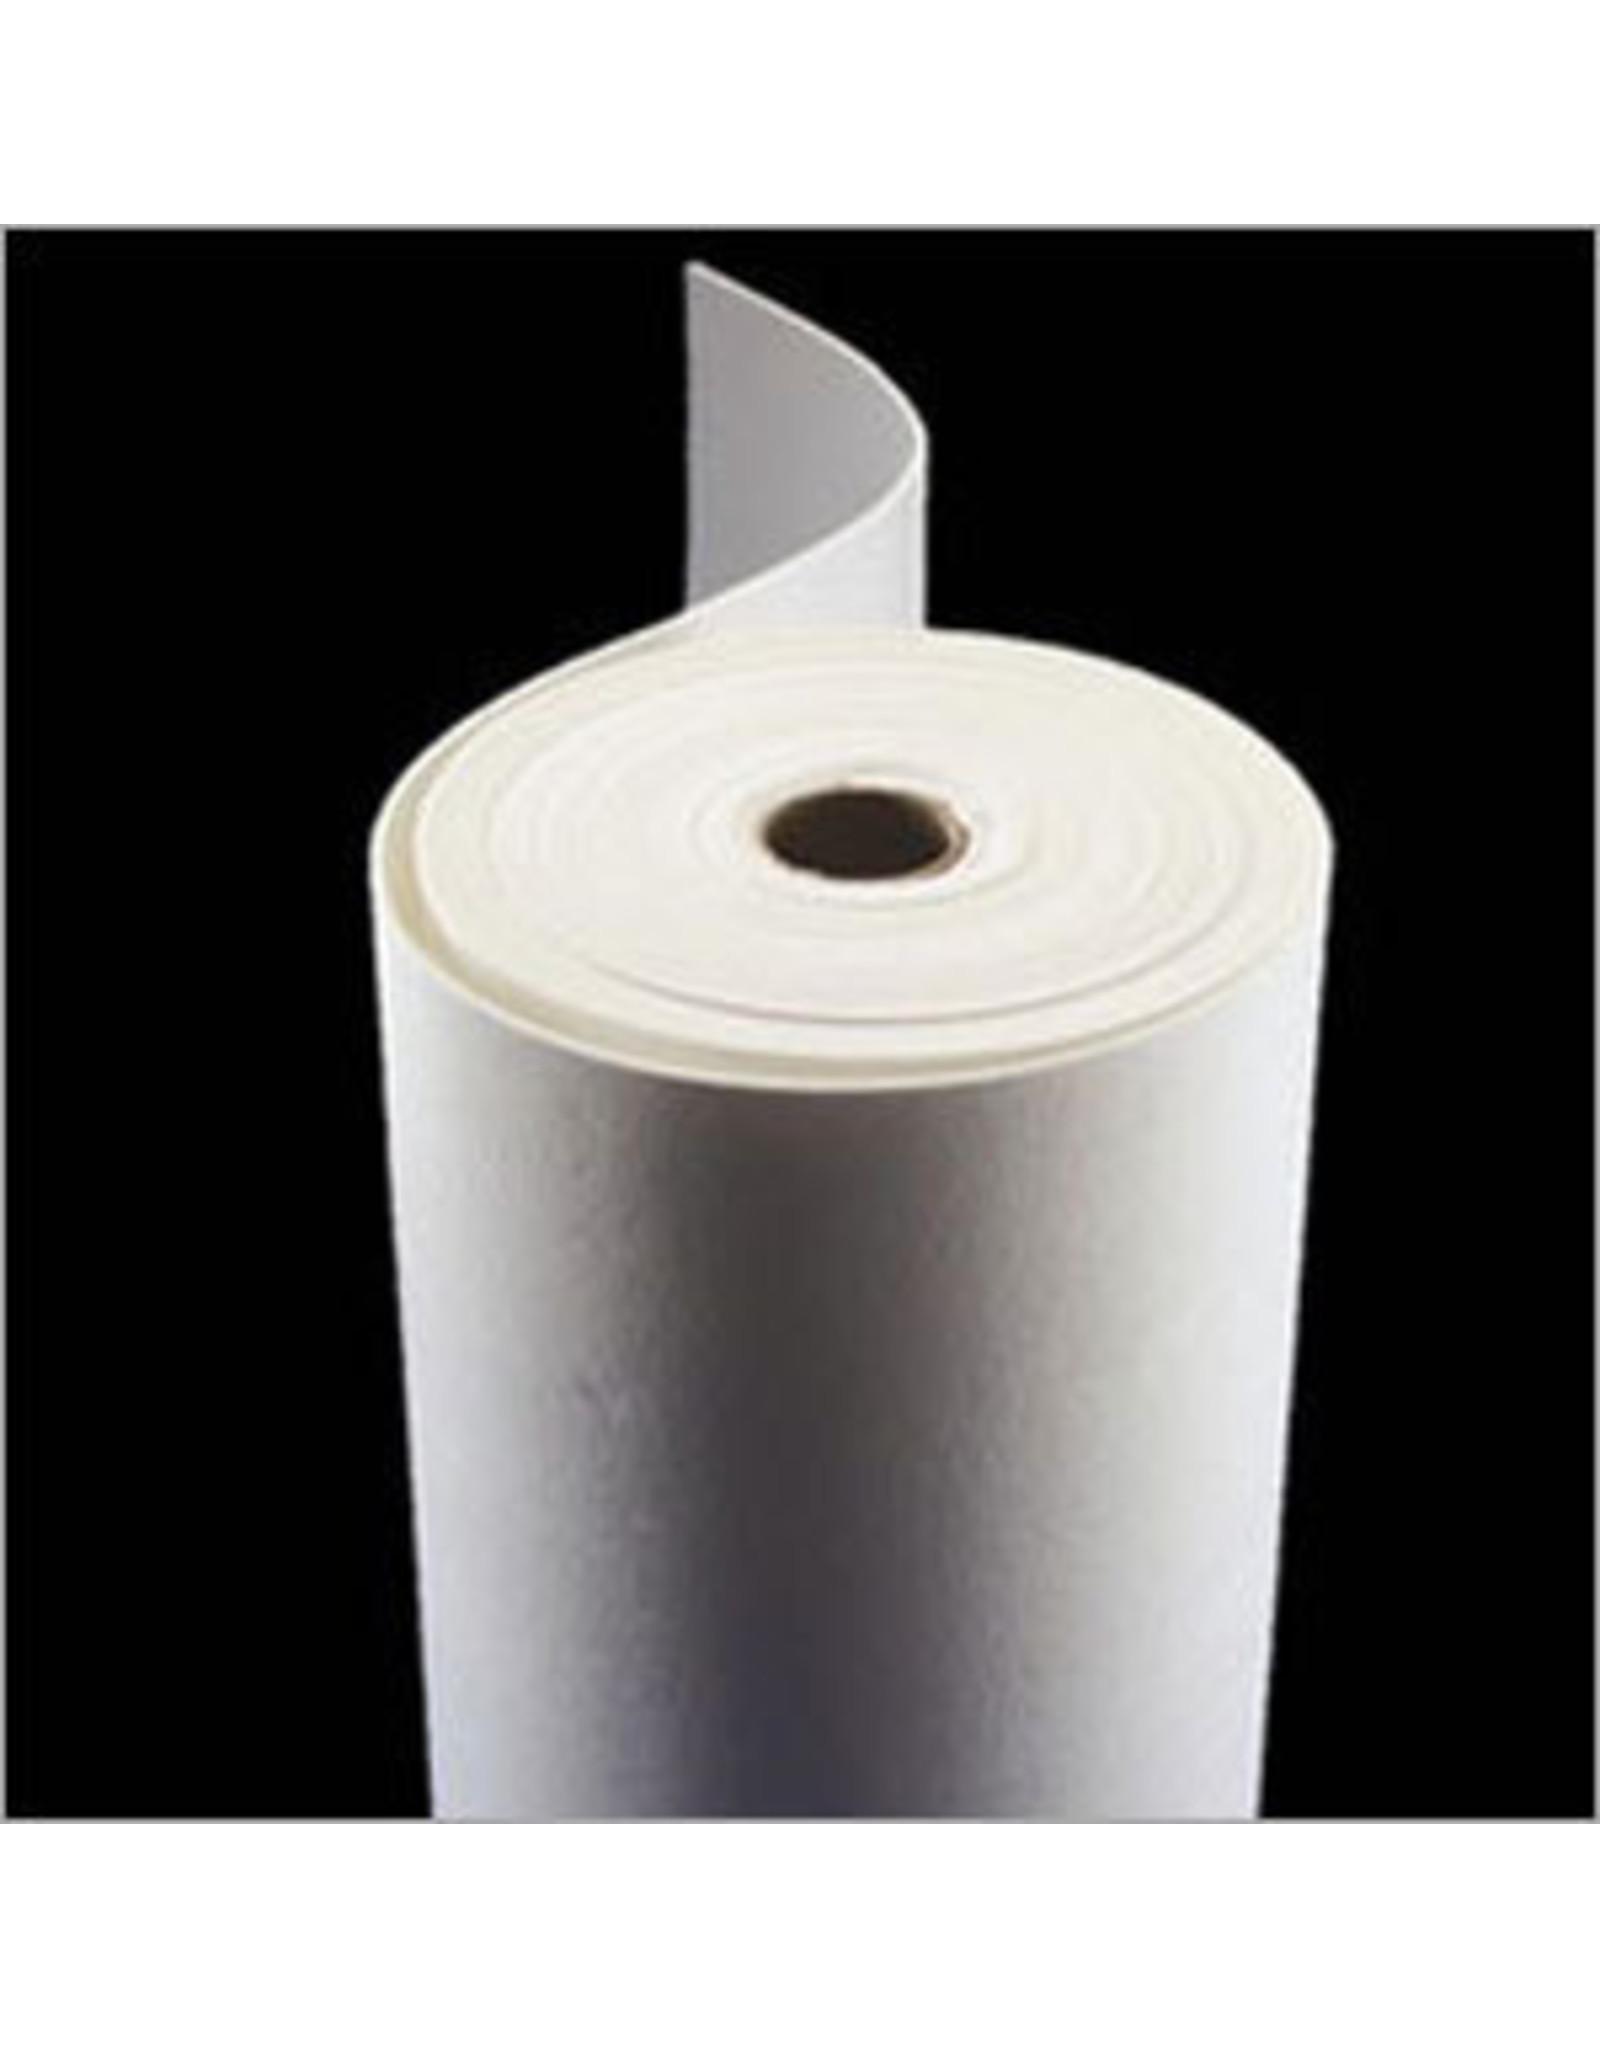 3mm ceramic fibre paper